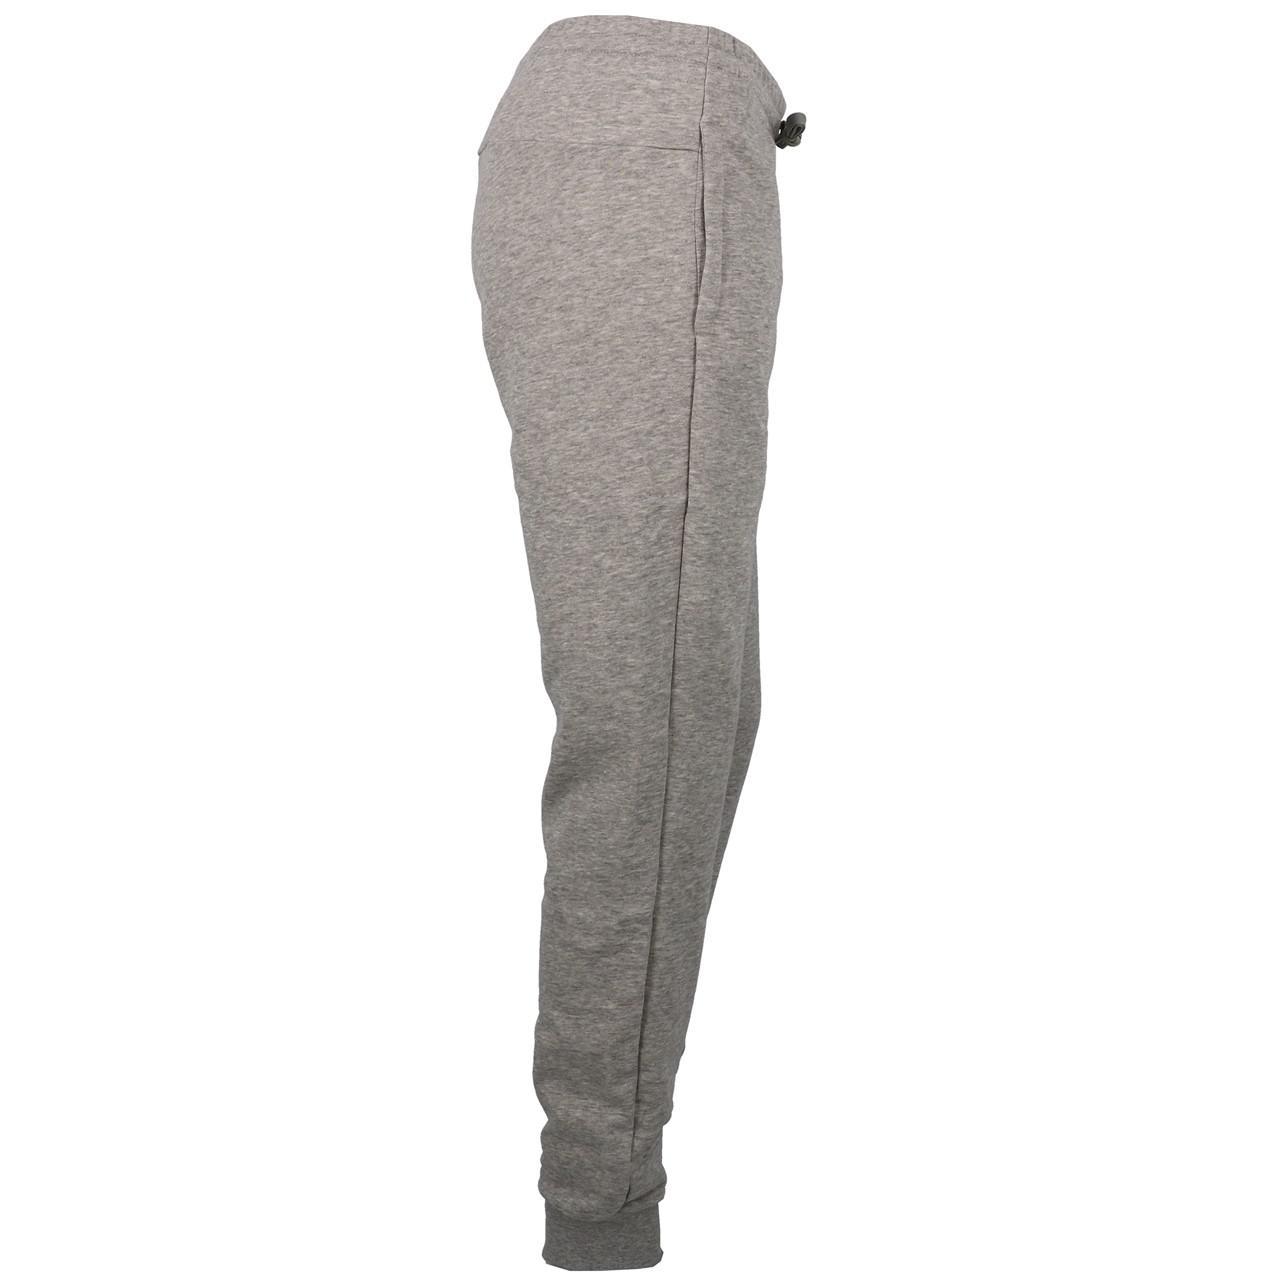 Pantalon-de-survetement-Adidas-E-pln-pant-grey-mel-l-Gris-18973-Neuf miniature 2